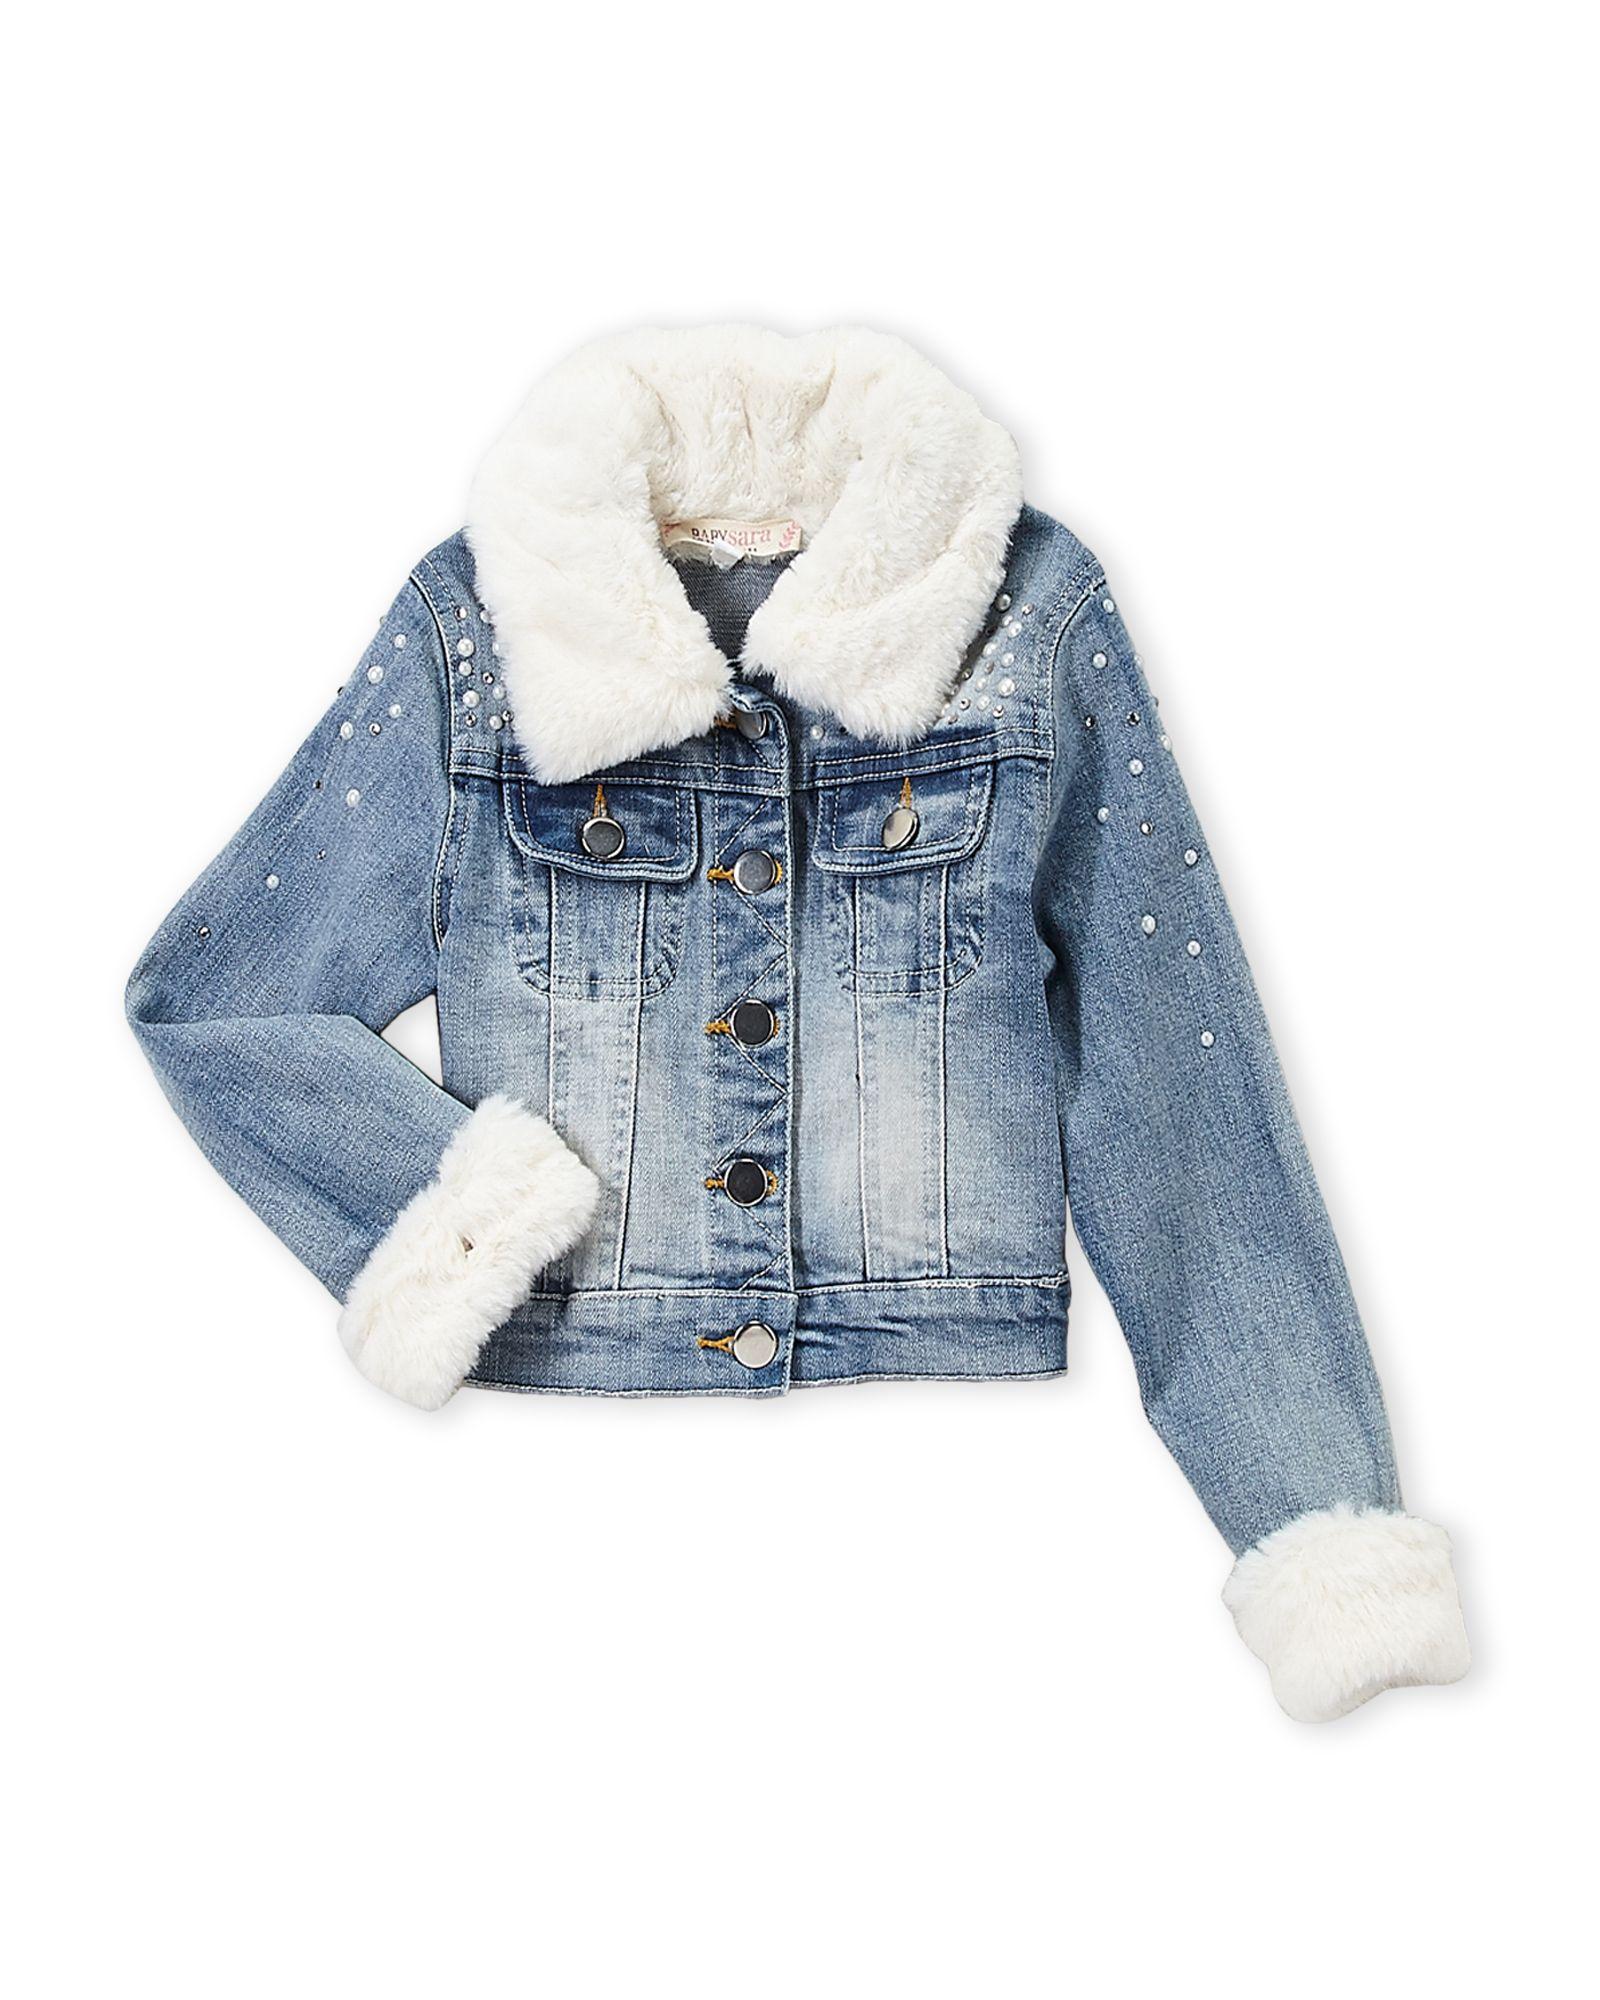 Baby Sara Toddler Girls Faux Fur Trim Denim Jacket Estilo Chique Meninas Estilo [ 2000 x 1600 Pixel ]